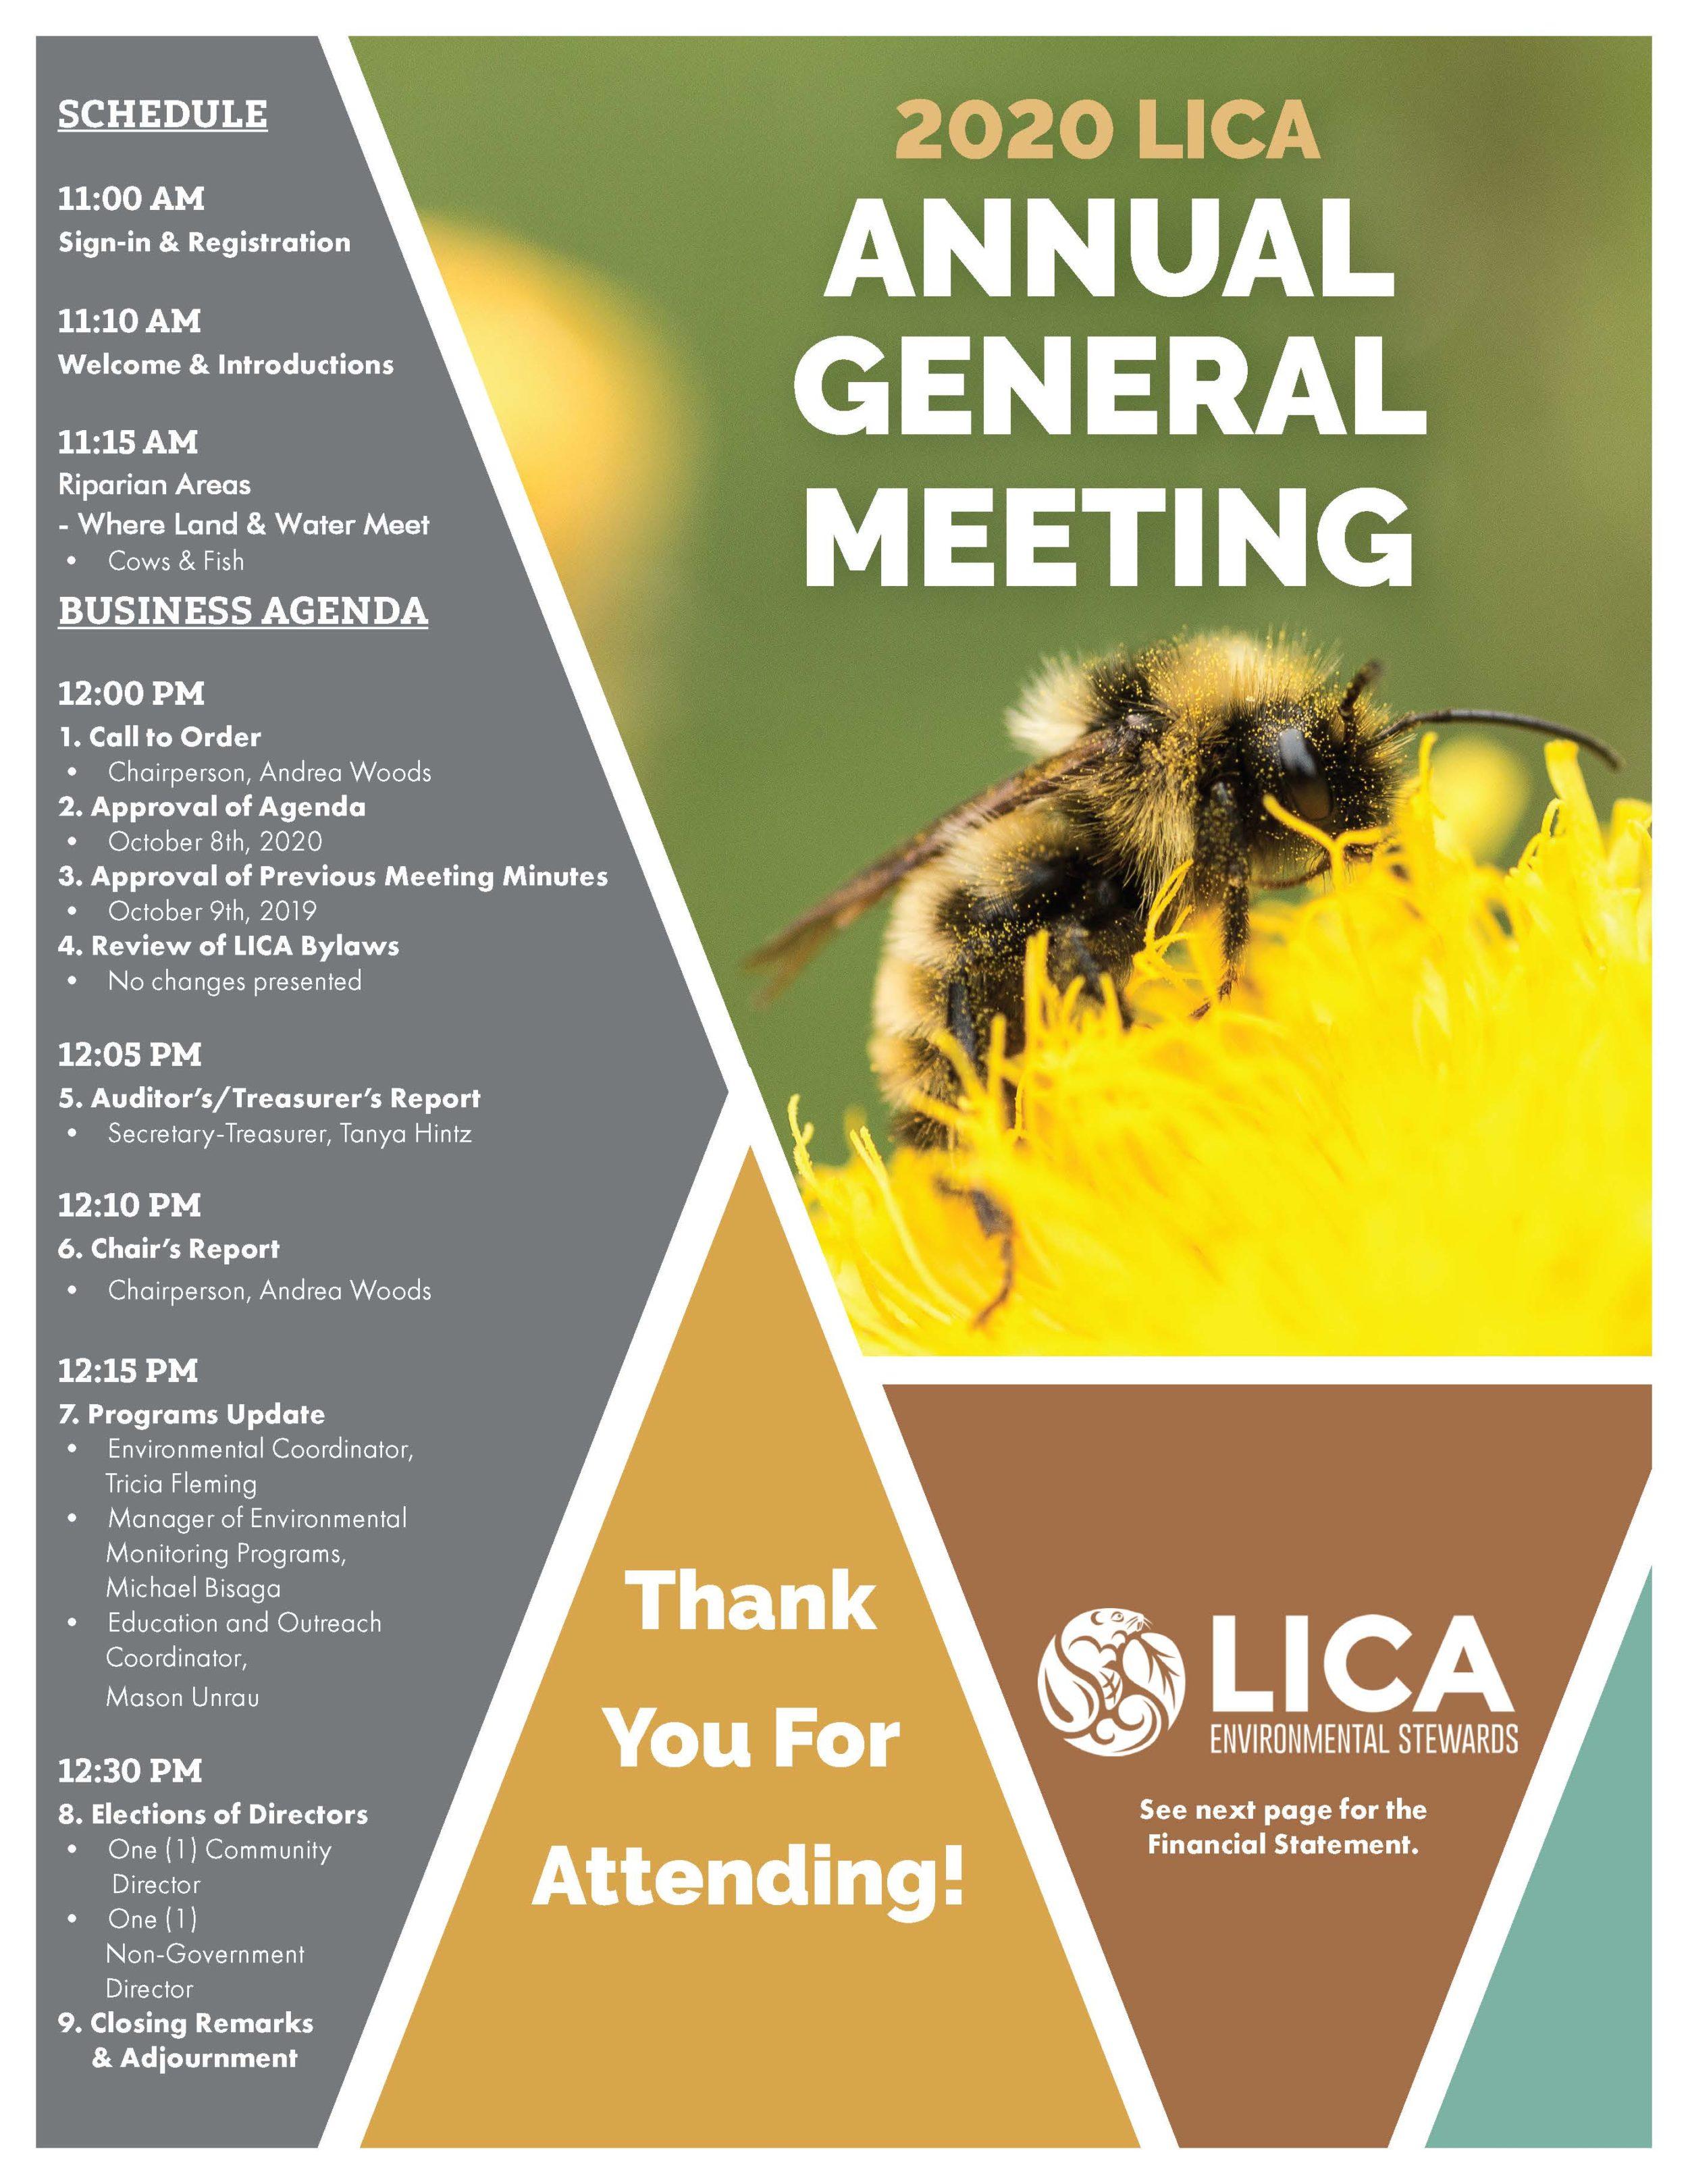 LICA Environmental Stewards 20th Anniversary AGM